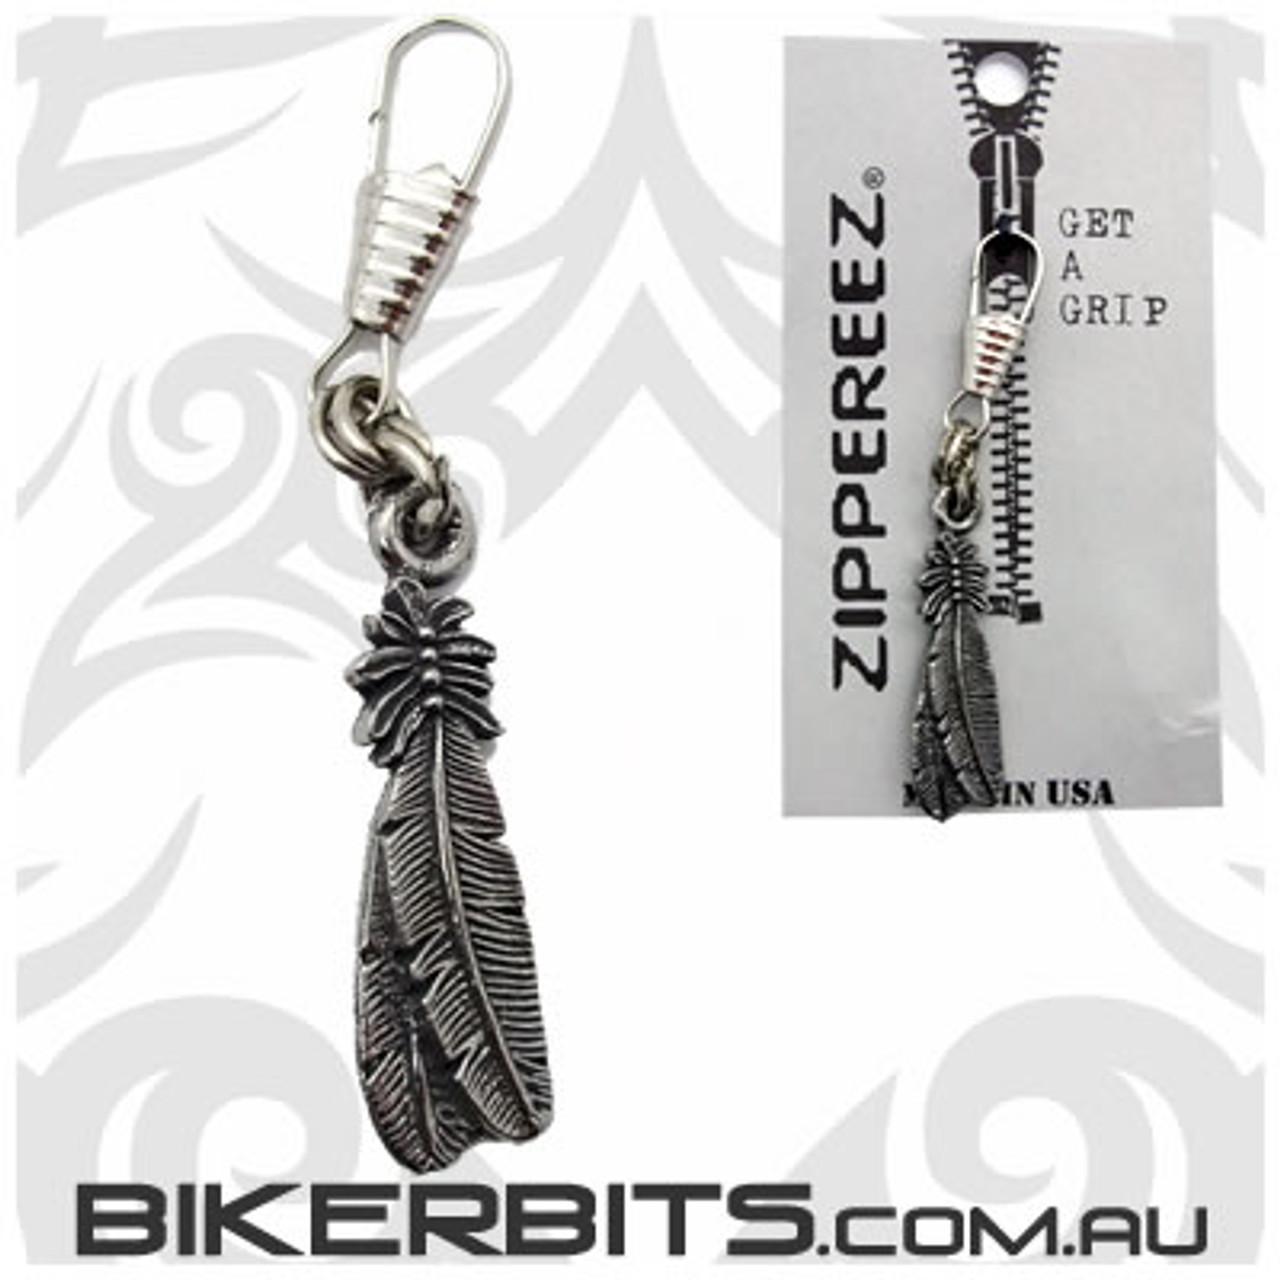 Zippereez Zipper Pull - Feathers